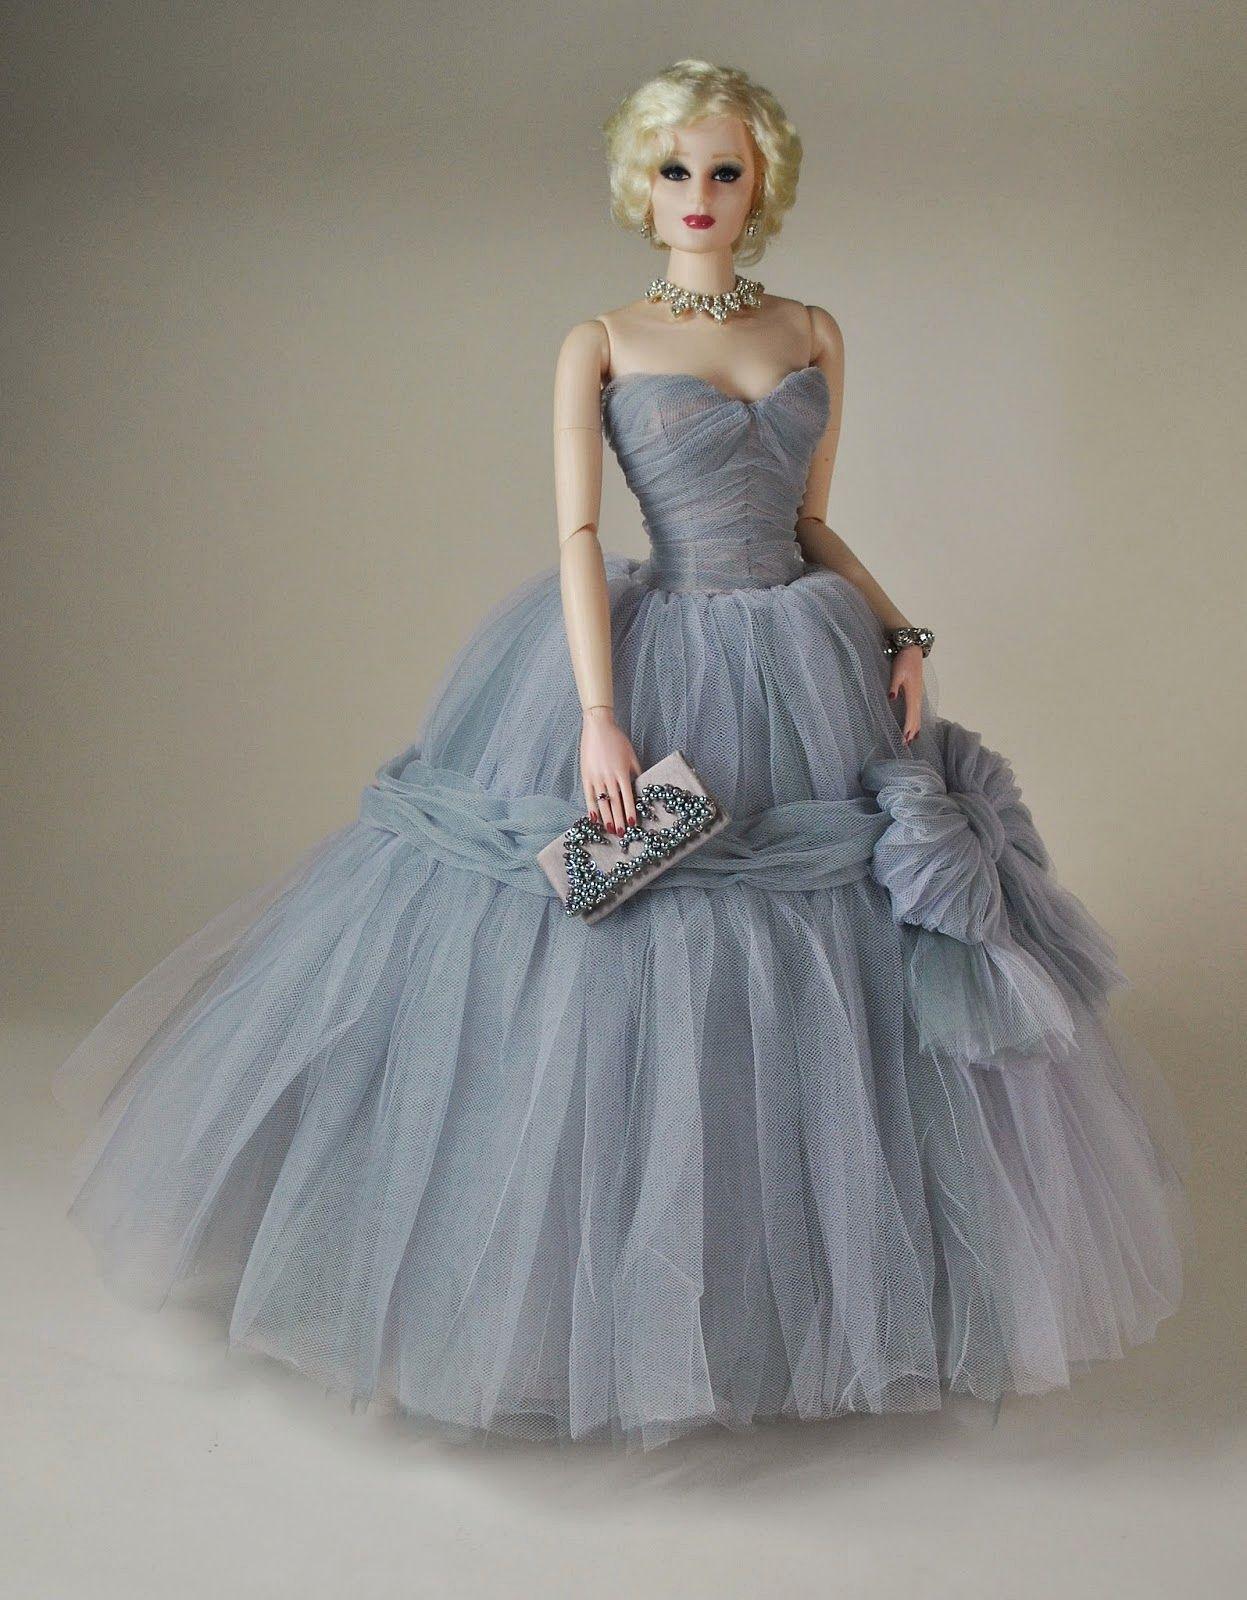 Unique Bella Swan Wedding Gown Motif - All Wedding Dresses ...